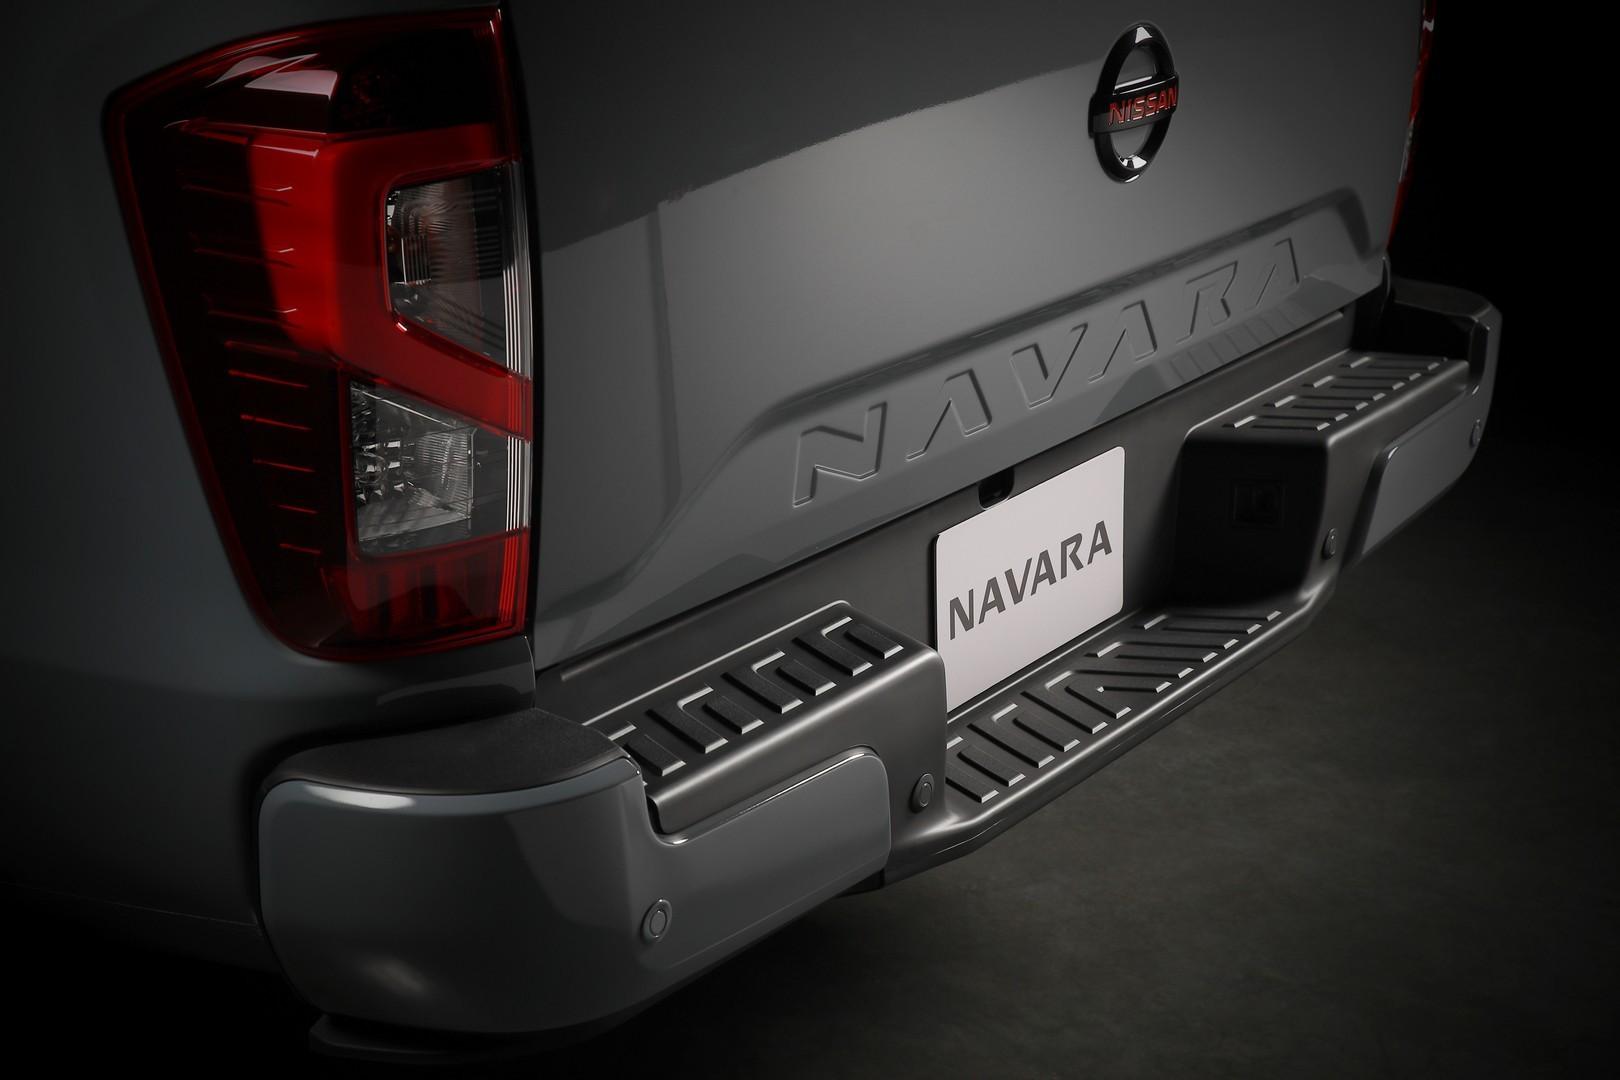 Nissan-Navara-2021-facelift-22